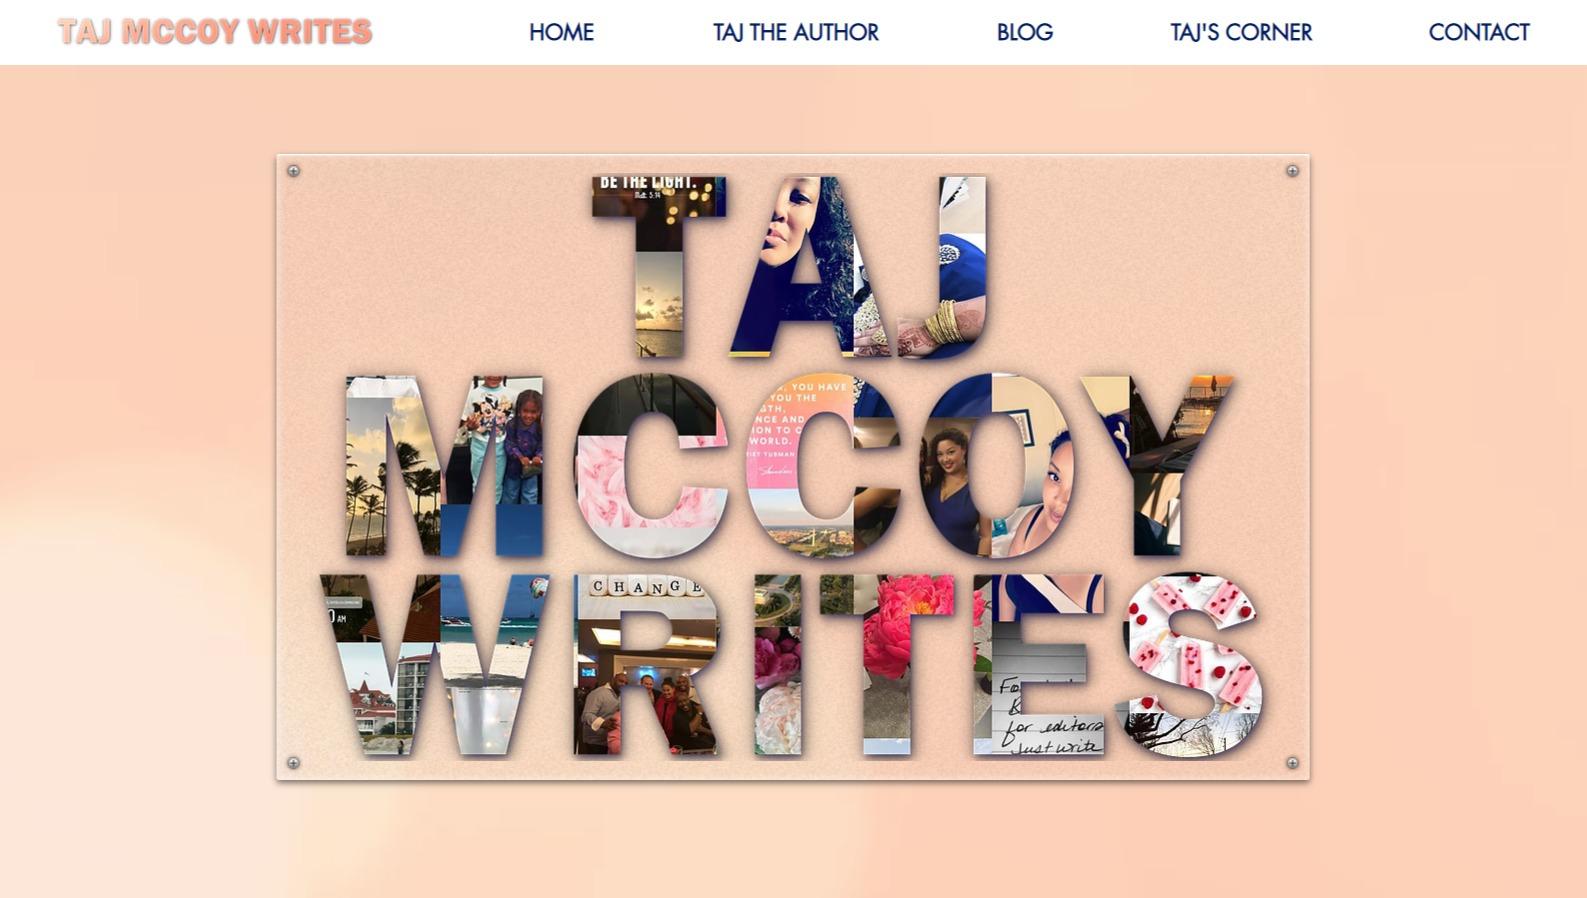 Author Taj McCoy